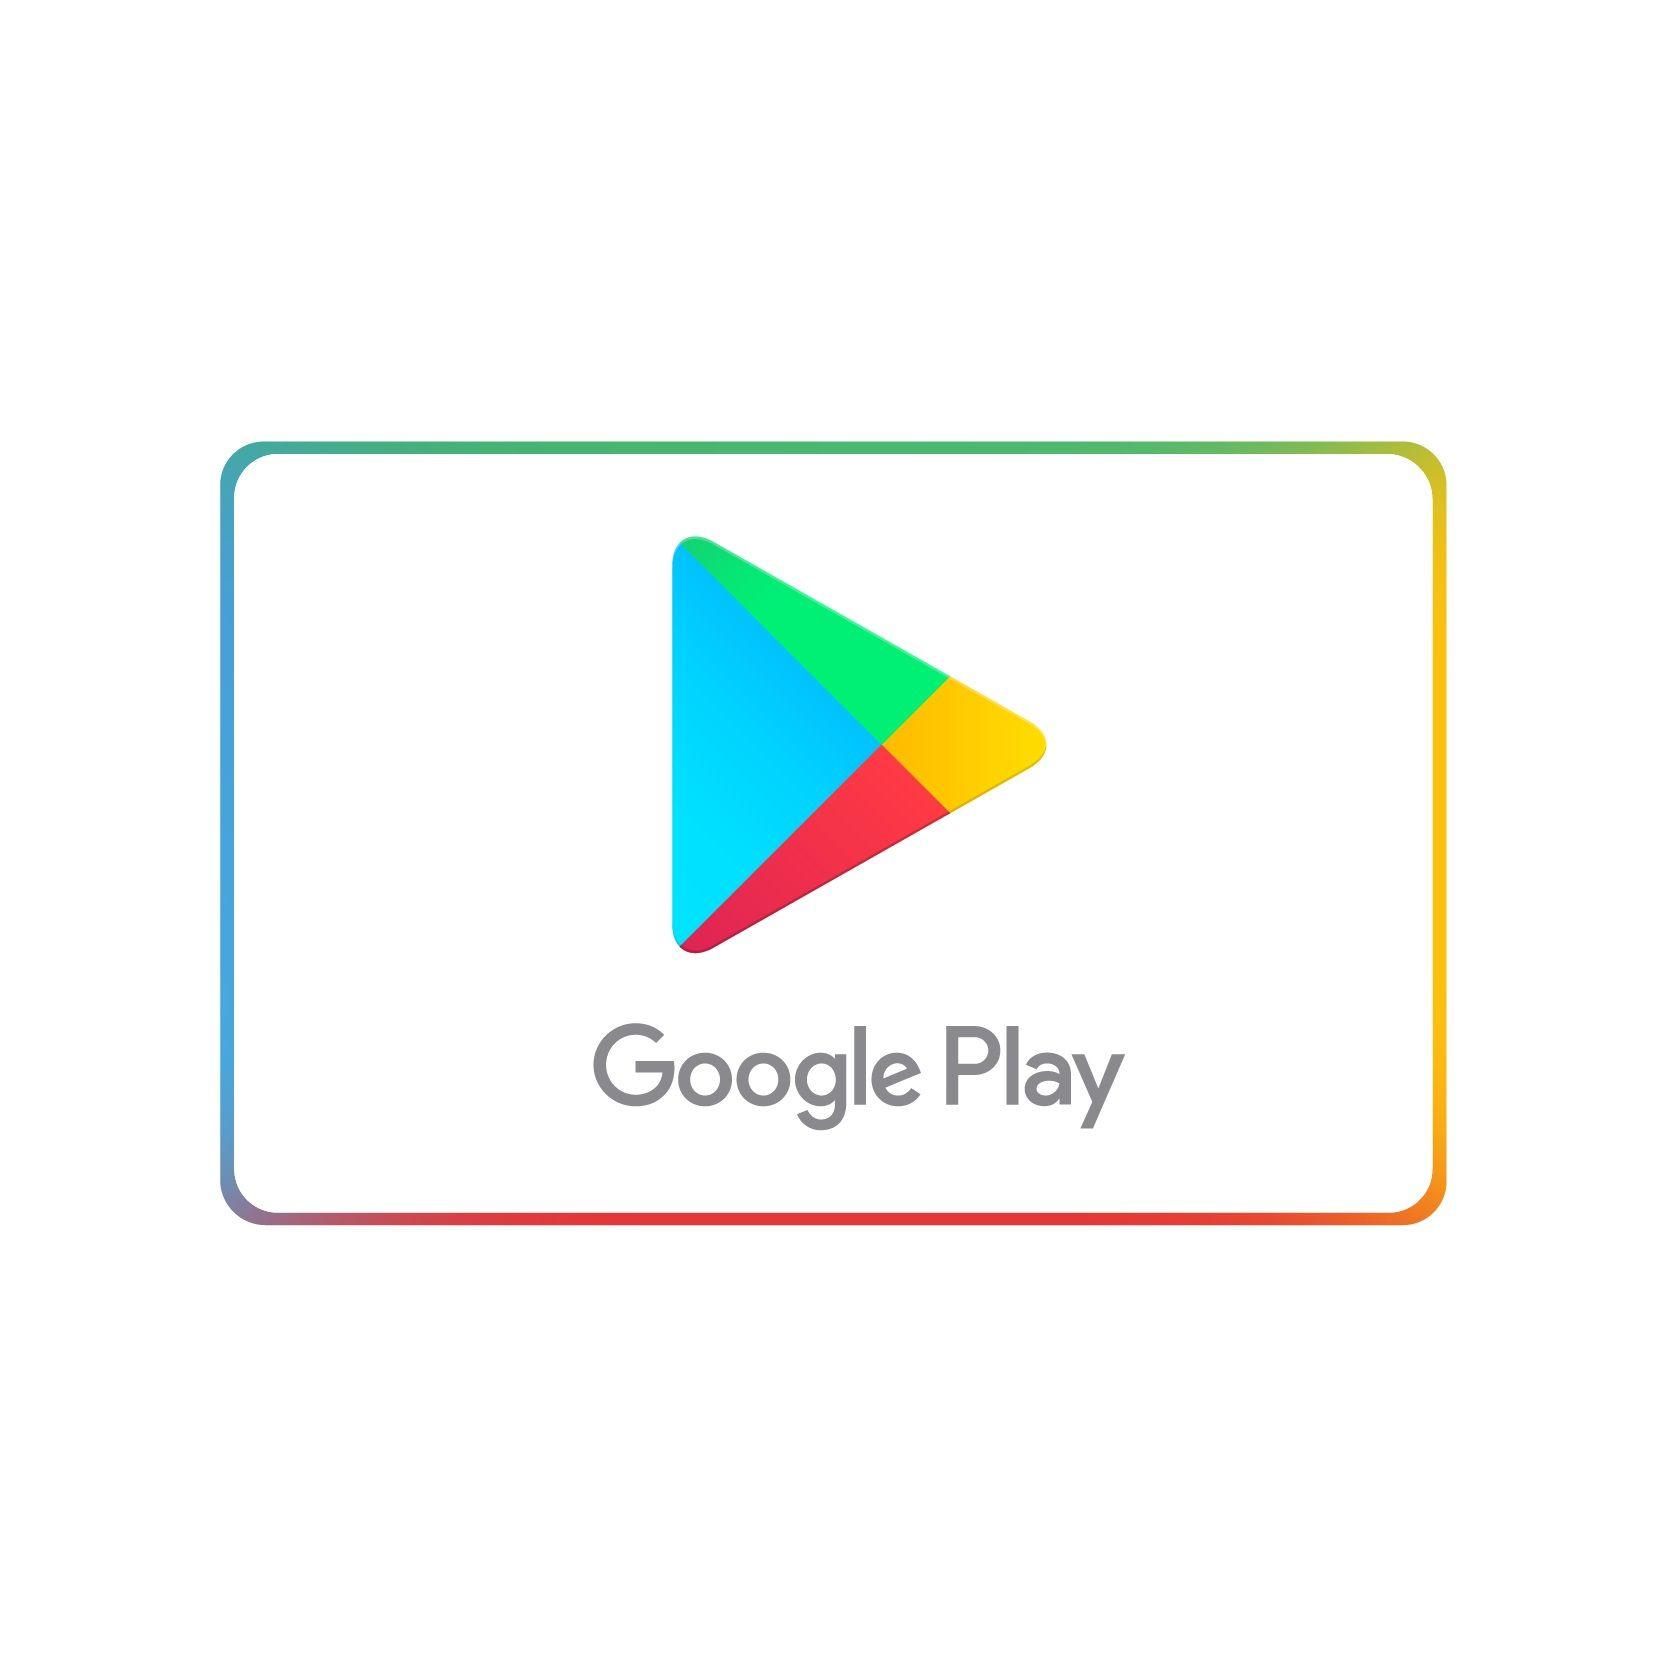 Adaugă Pin Pe Google Play